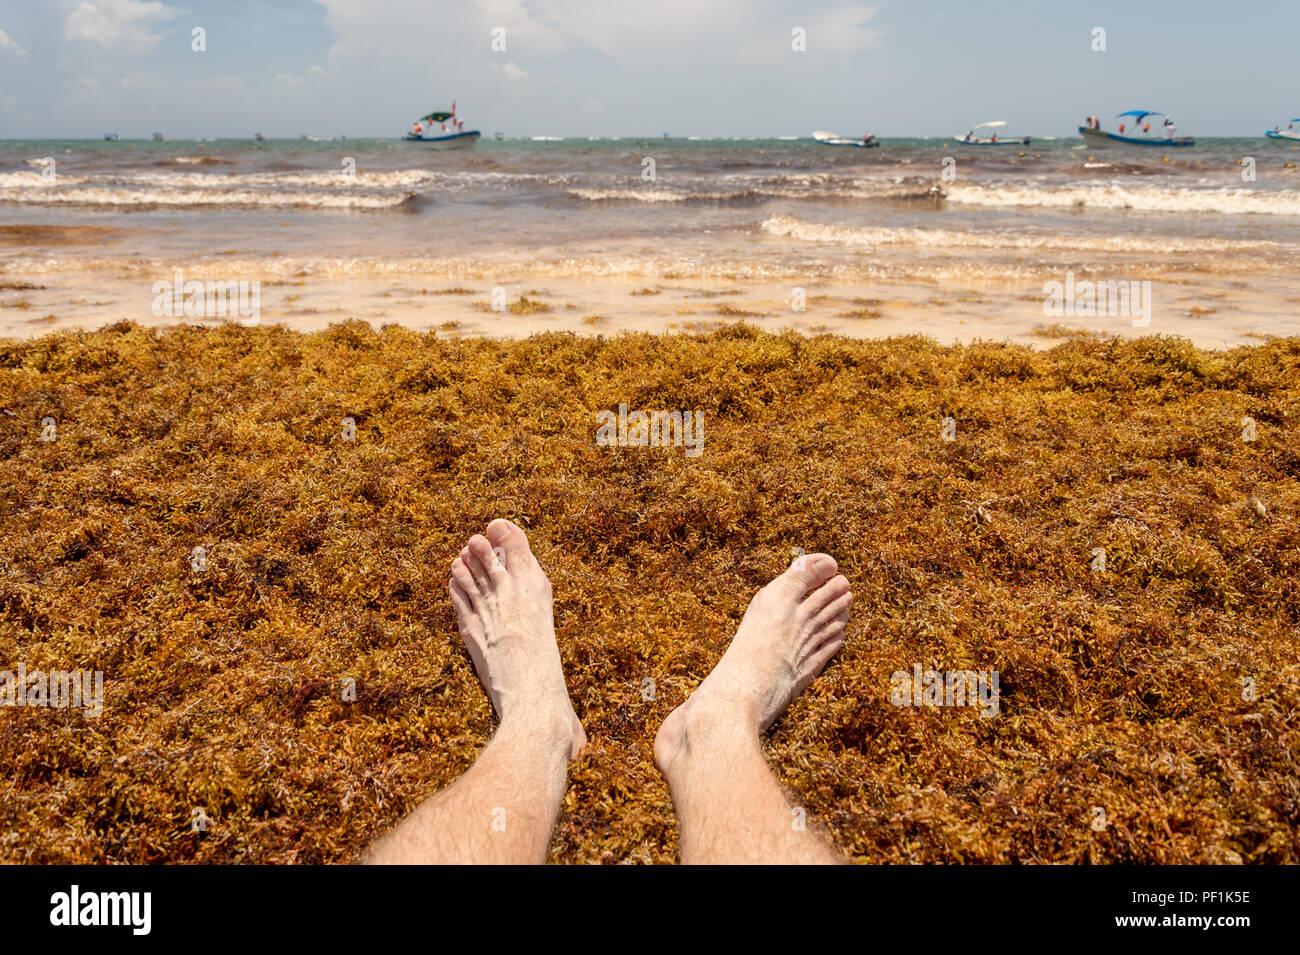 Feet on Sargassum seaweed at the beach, near Tulum, Mexico - Stock Image